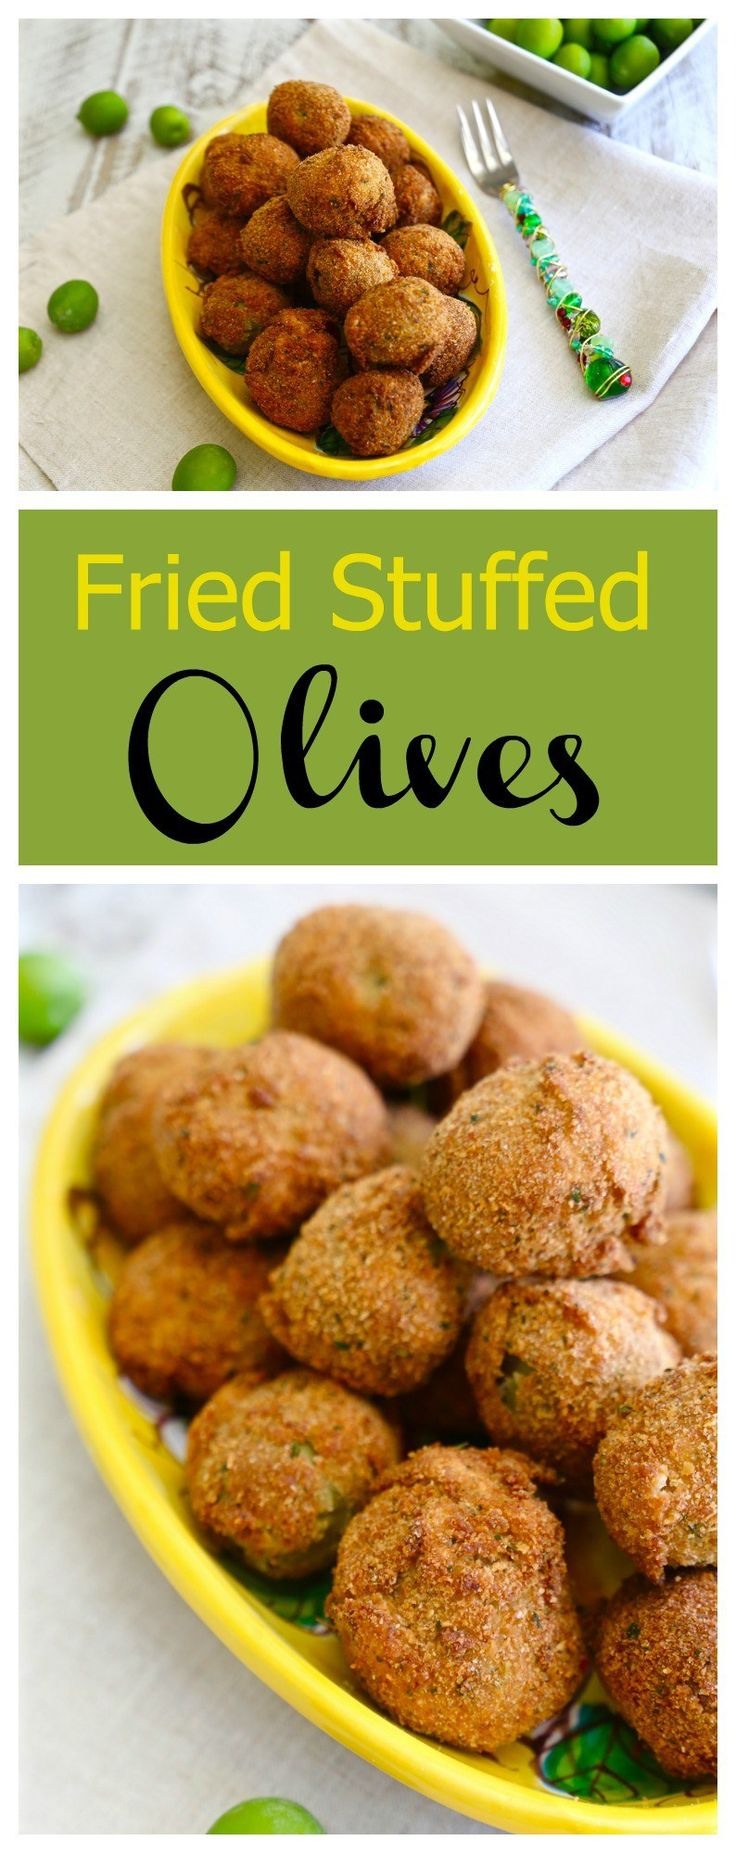 Italian Fried Stuffed Olives La Bella Vita Cucina